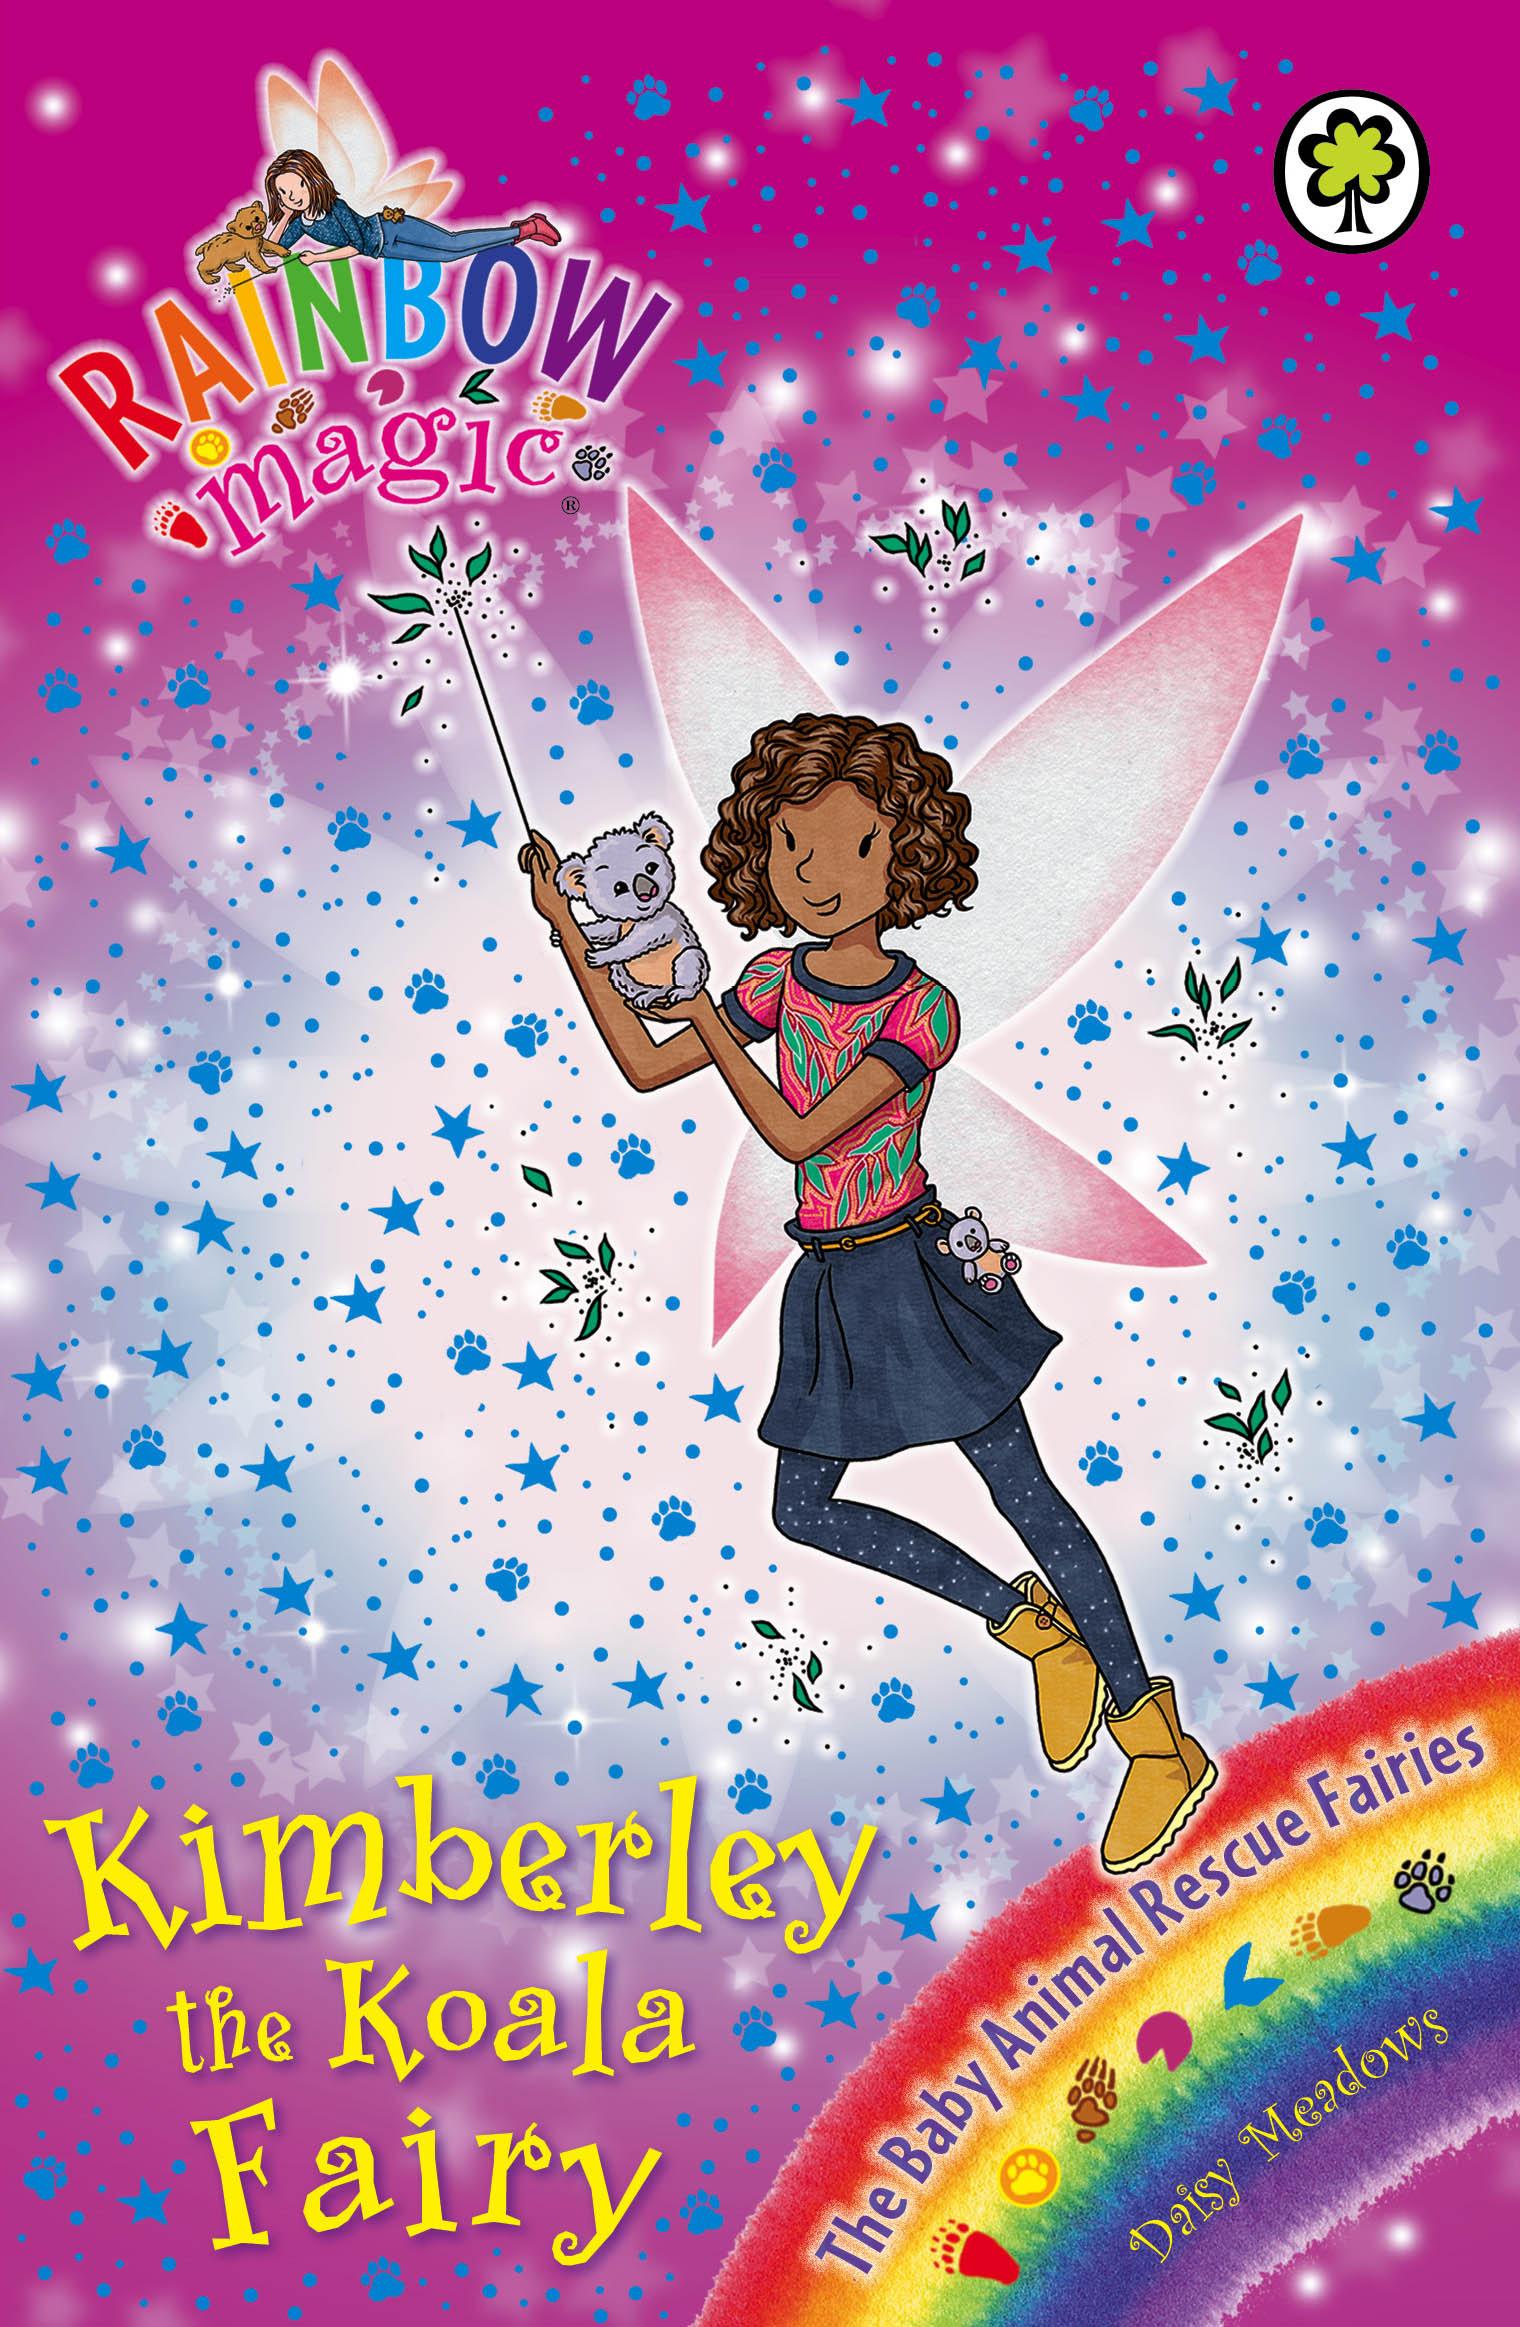 ... Rainbow Magic: Kimberley the Koala Fairy: The Baby Animal Rescue  Fairies Book 5 · Download Image · Download Image